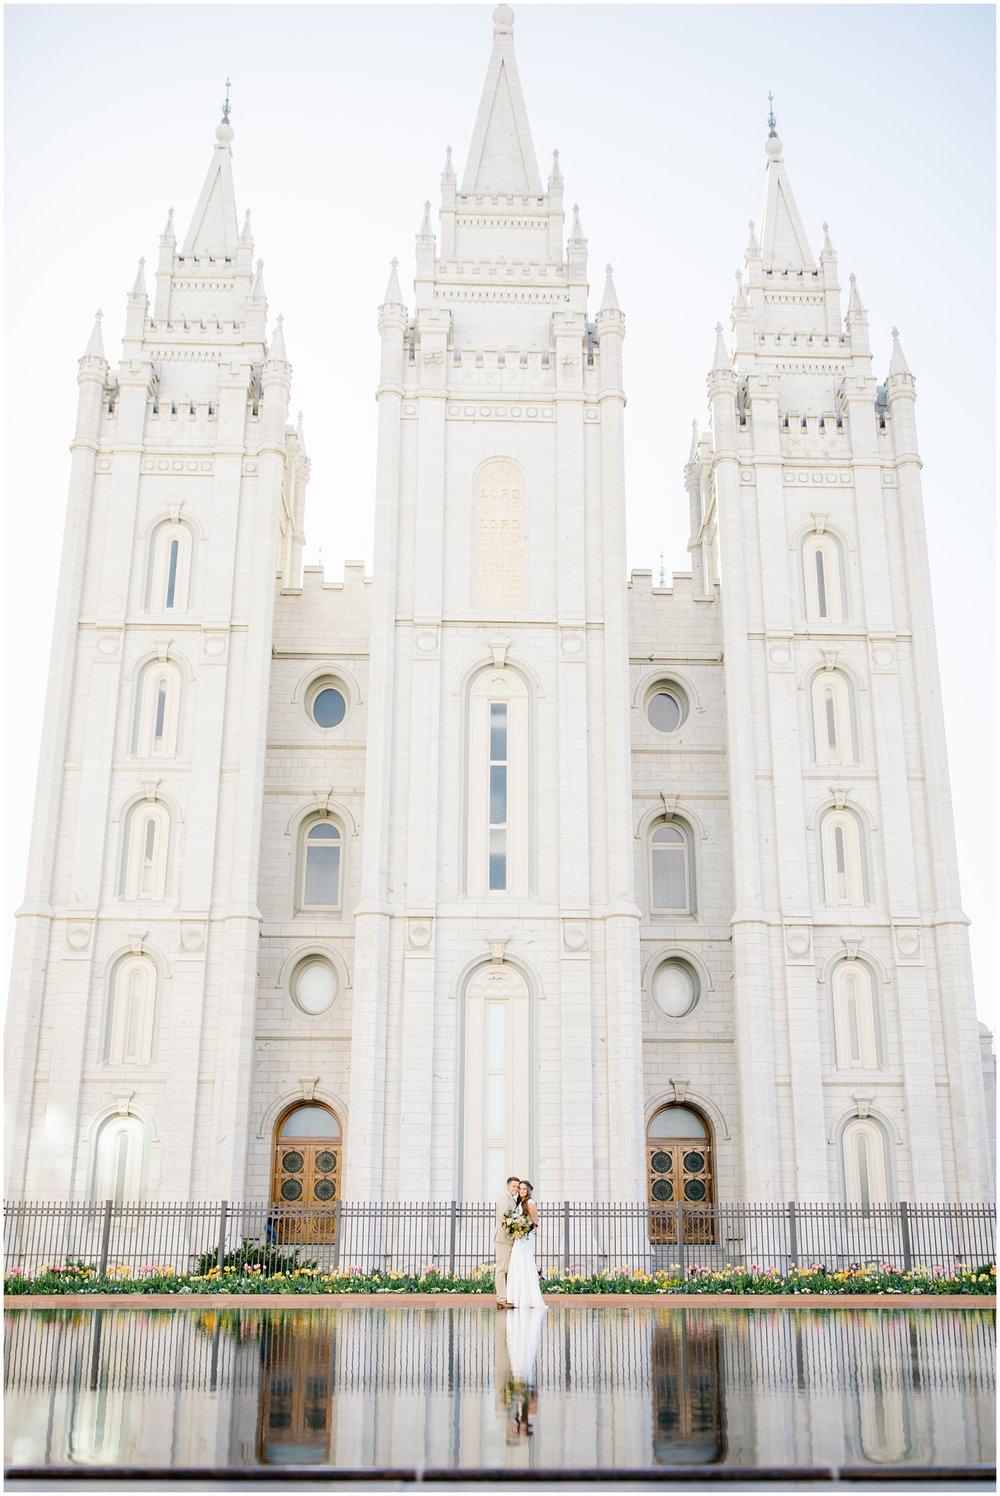 JC-Wedding-207_Lizzie-B-Imagery-Utah-Wedding-Photographer-Park-City-Salt-Lake-City-Temple-Joseph-Smith-Memorial-Building-Empire-Room.jpg